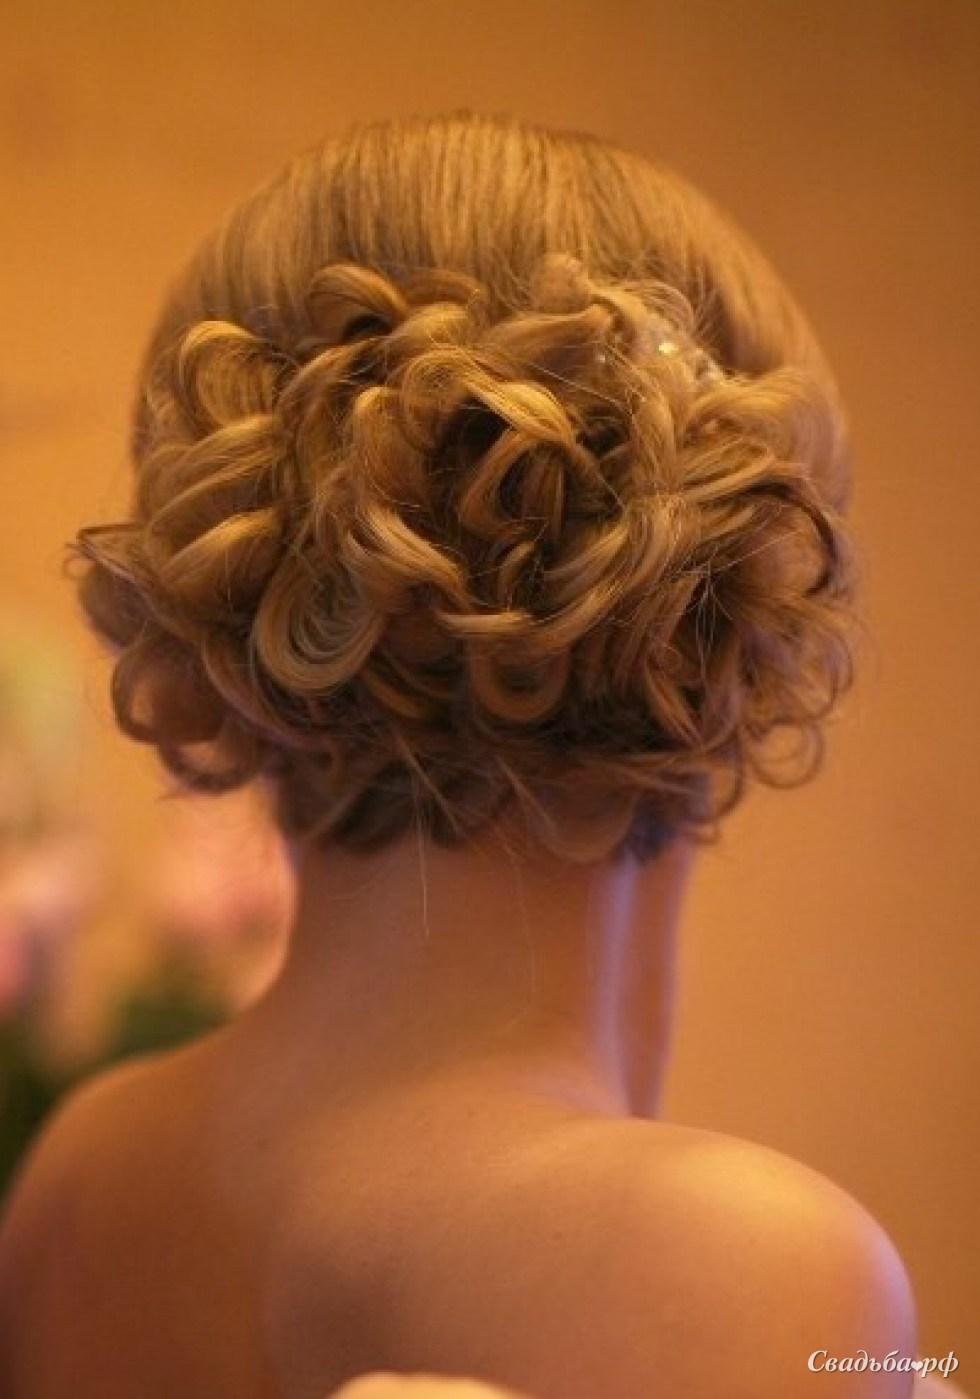 Прически из волос до плеча фото